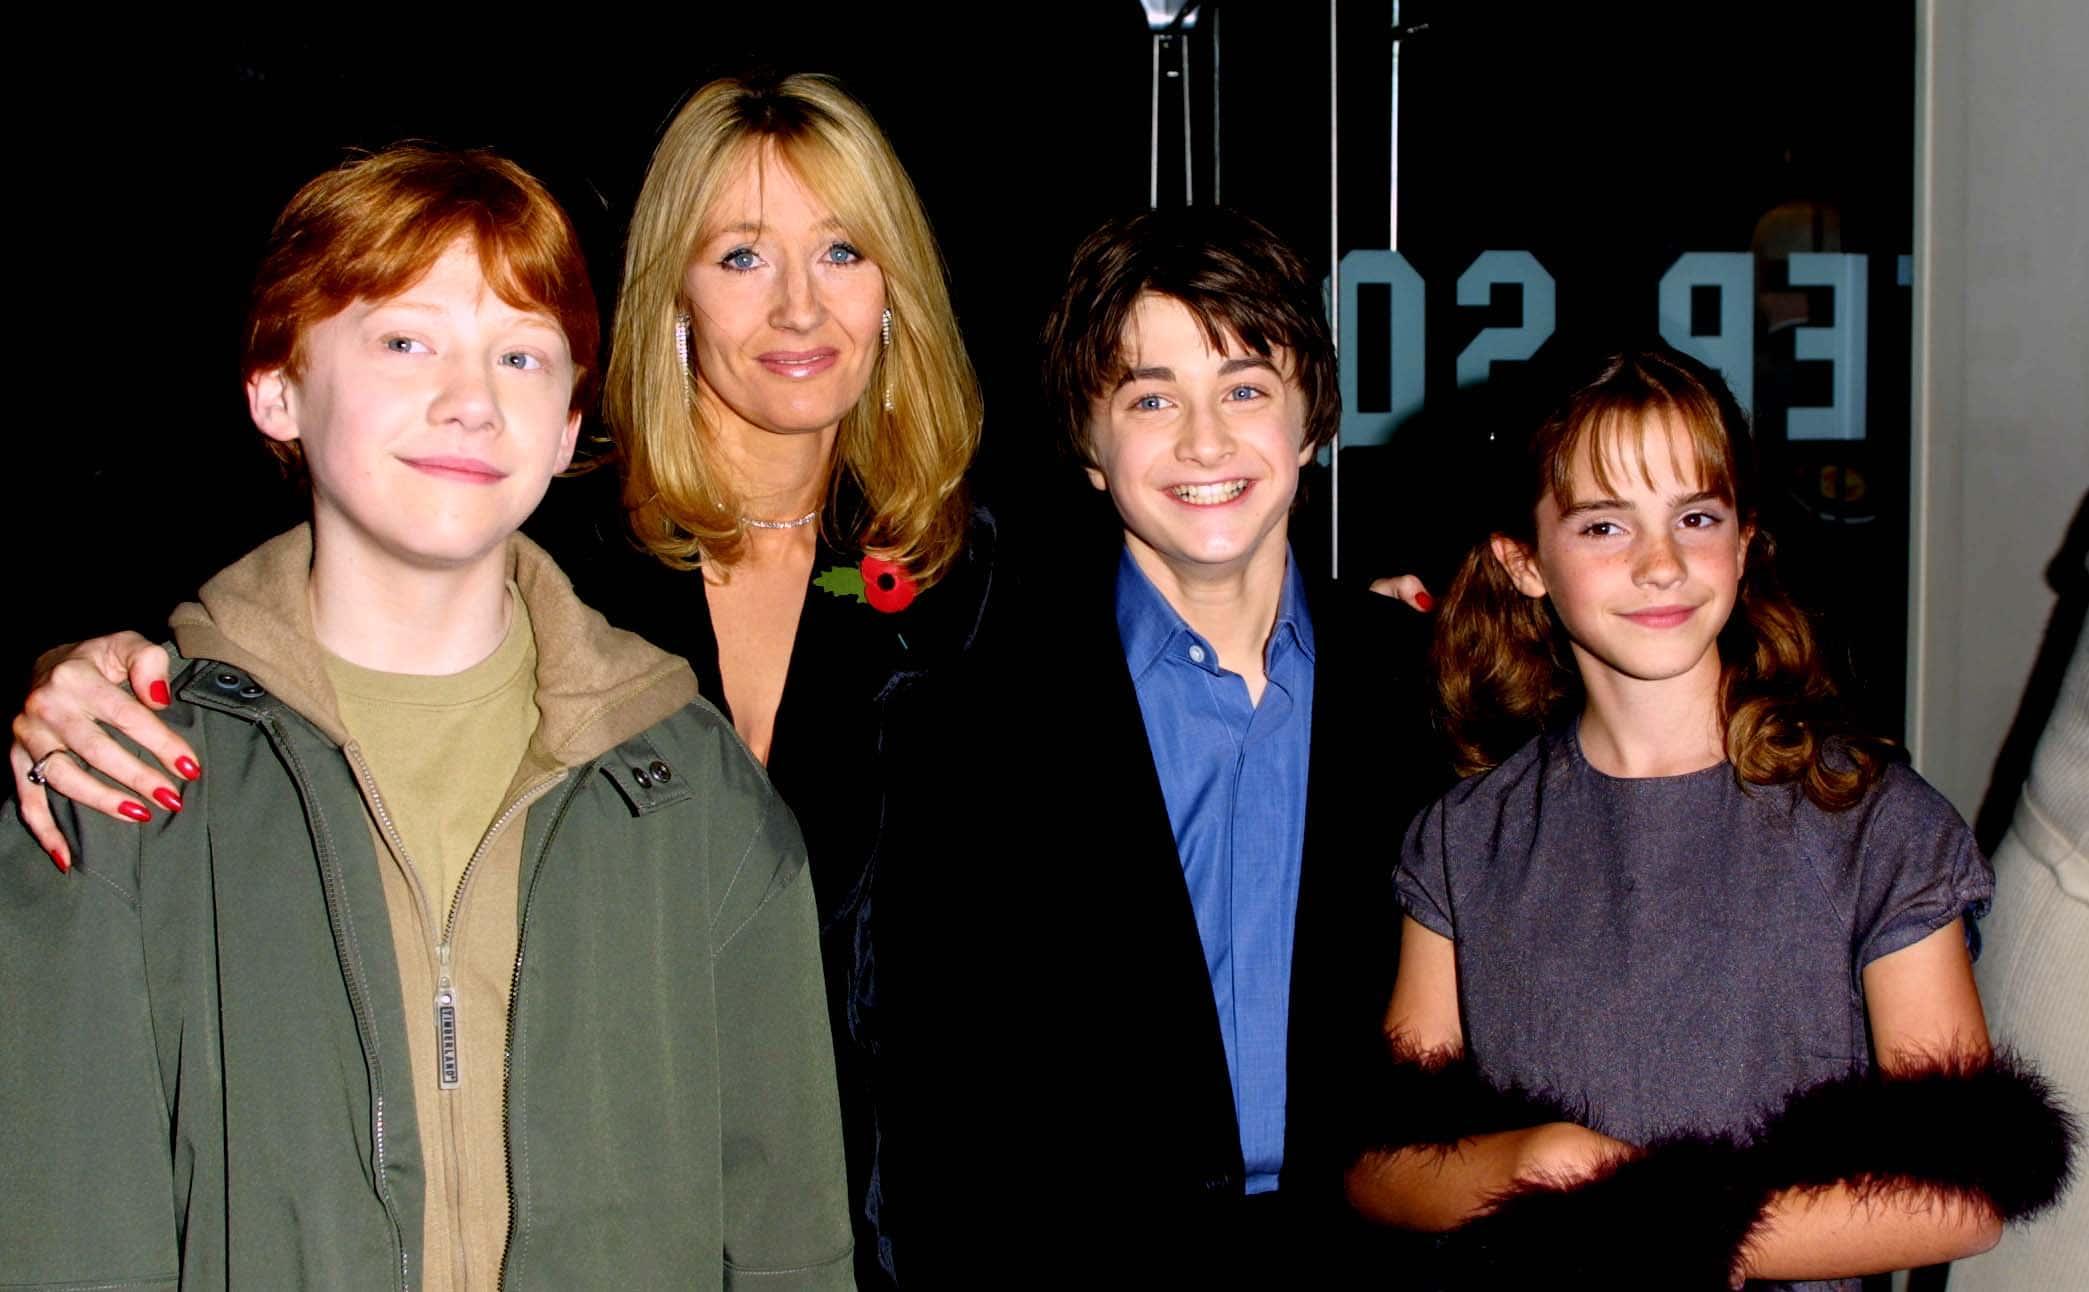 Hermione Granger facts